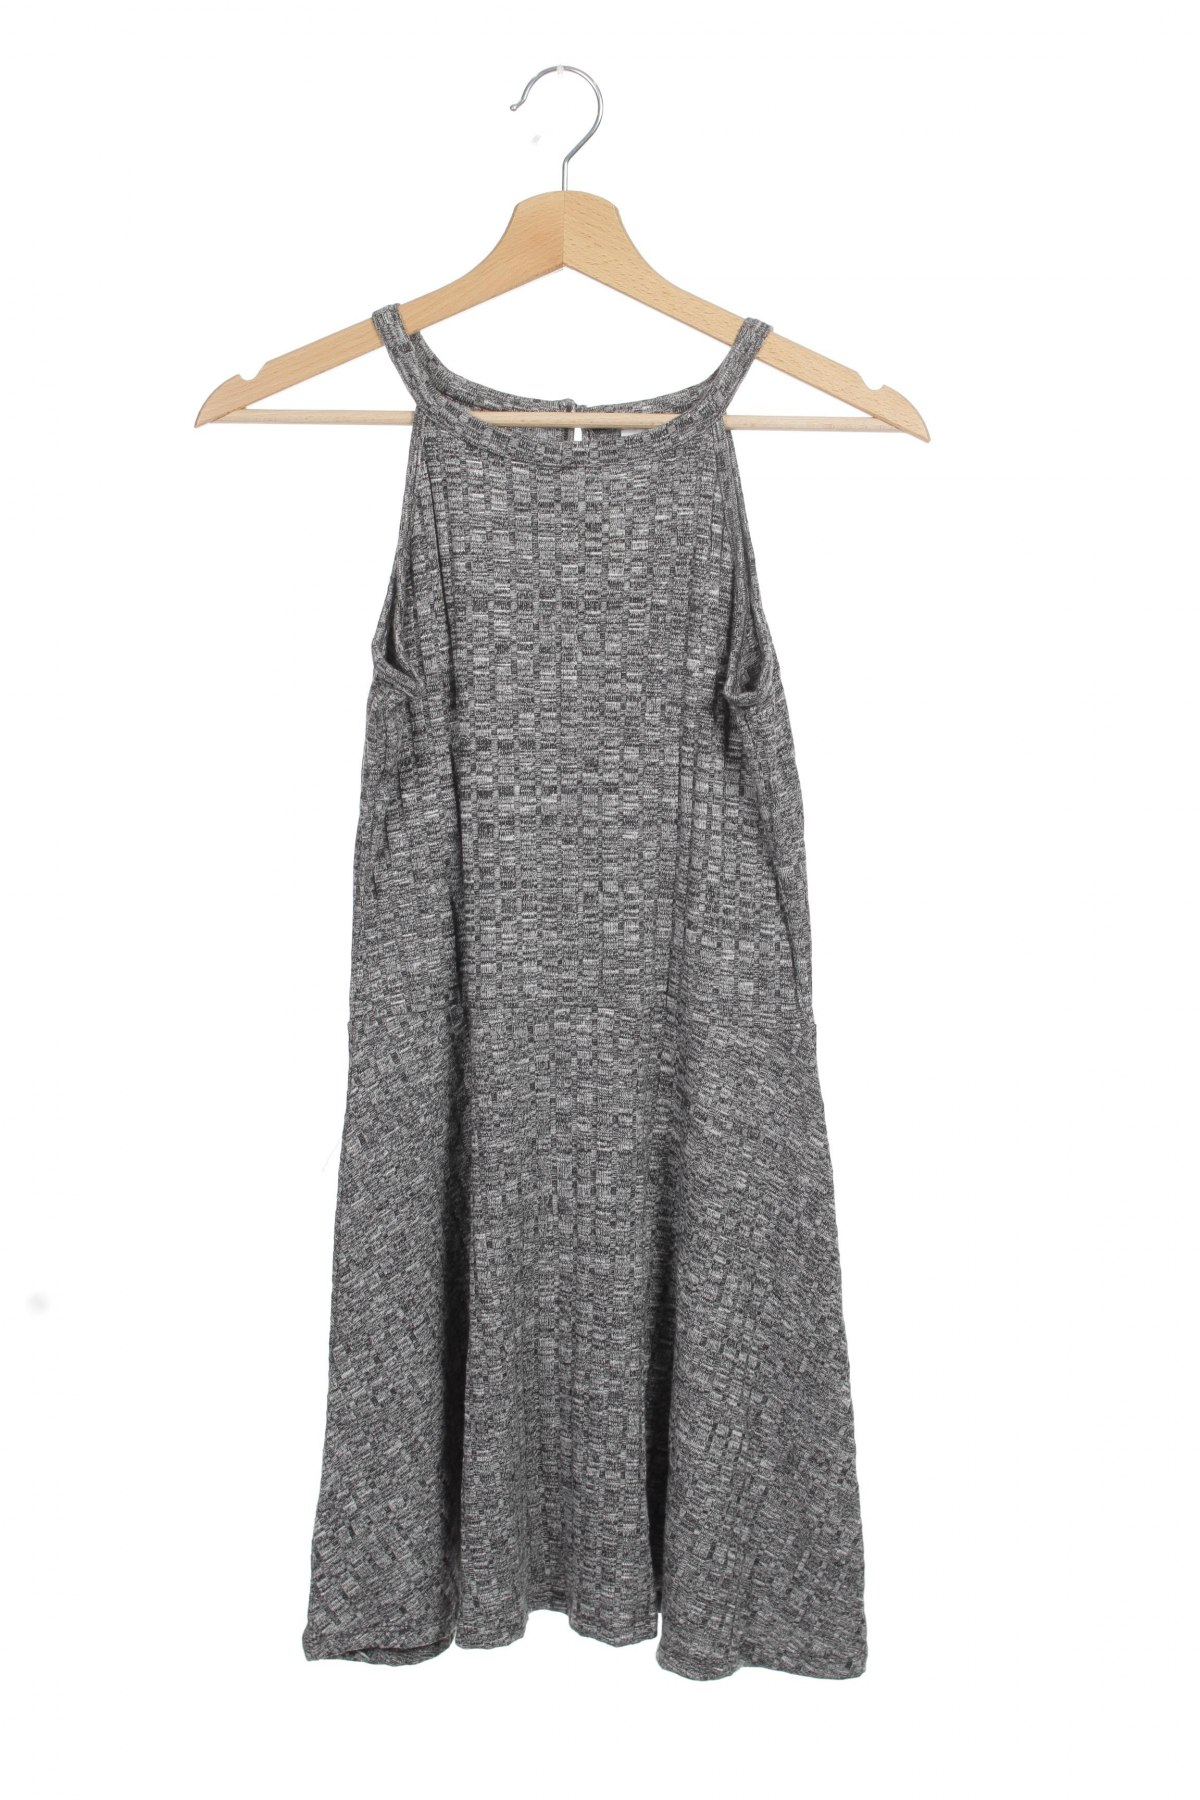 91093dca4a0 Παιδικό φόρεμα Here+There - σε συμφέρουσα τιμή στο Remix - #8188417